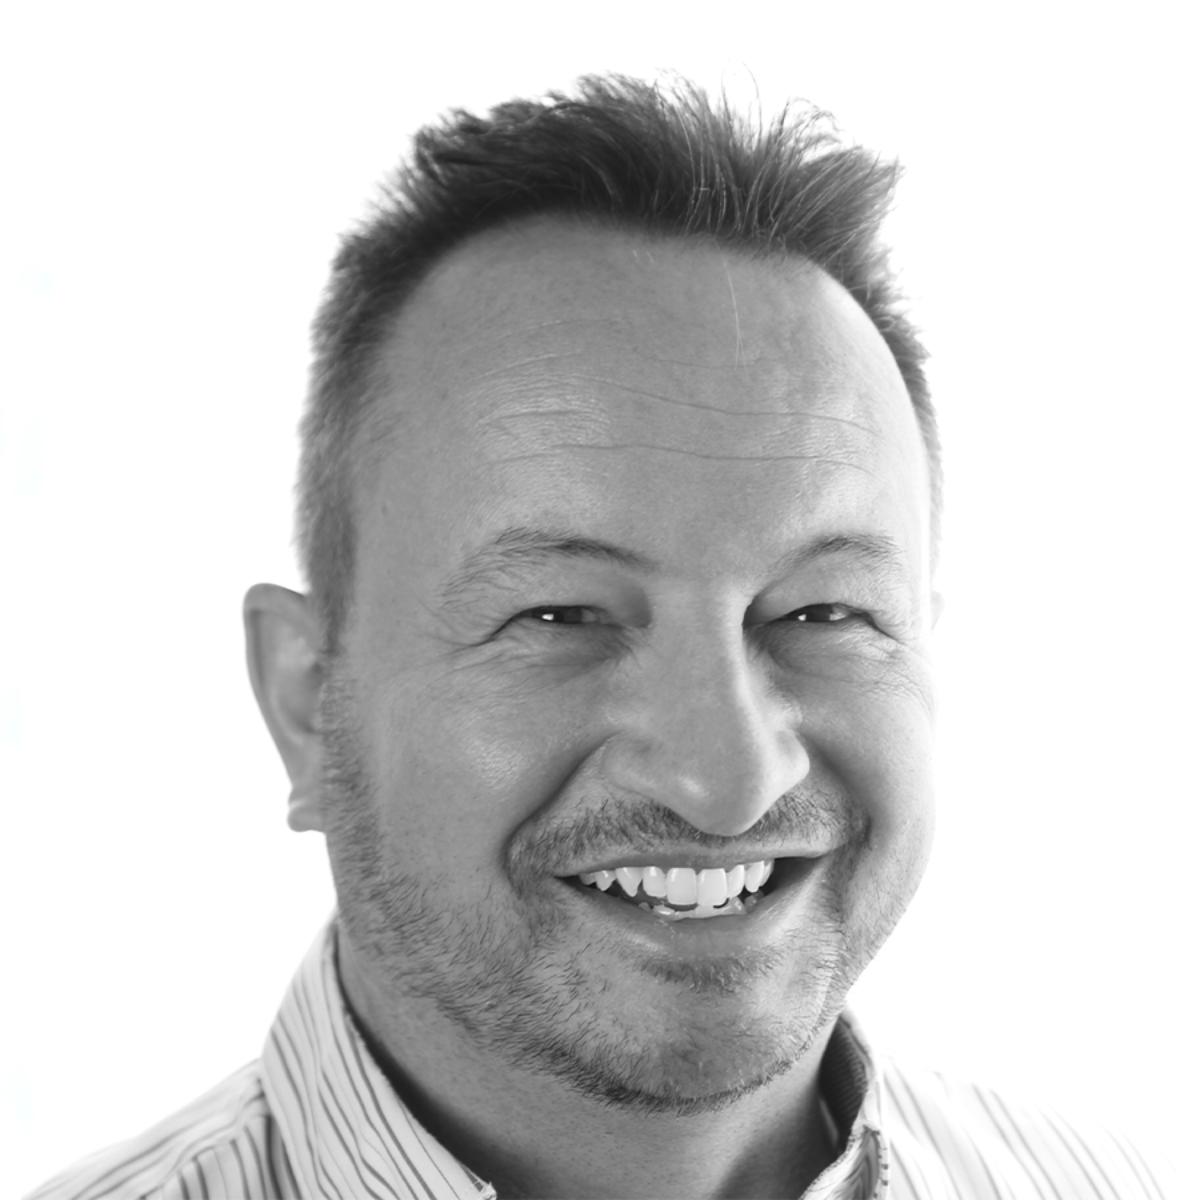 Dr. Markus Frasch